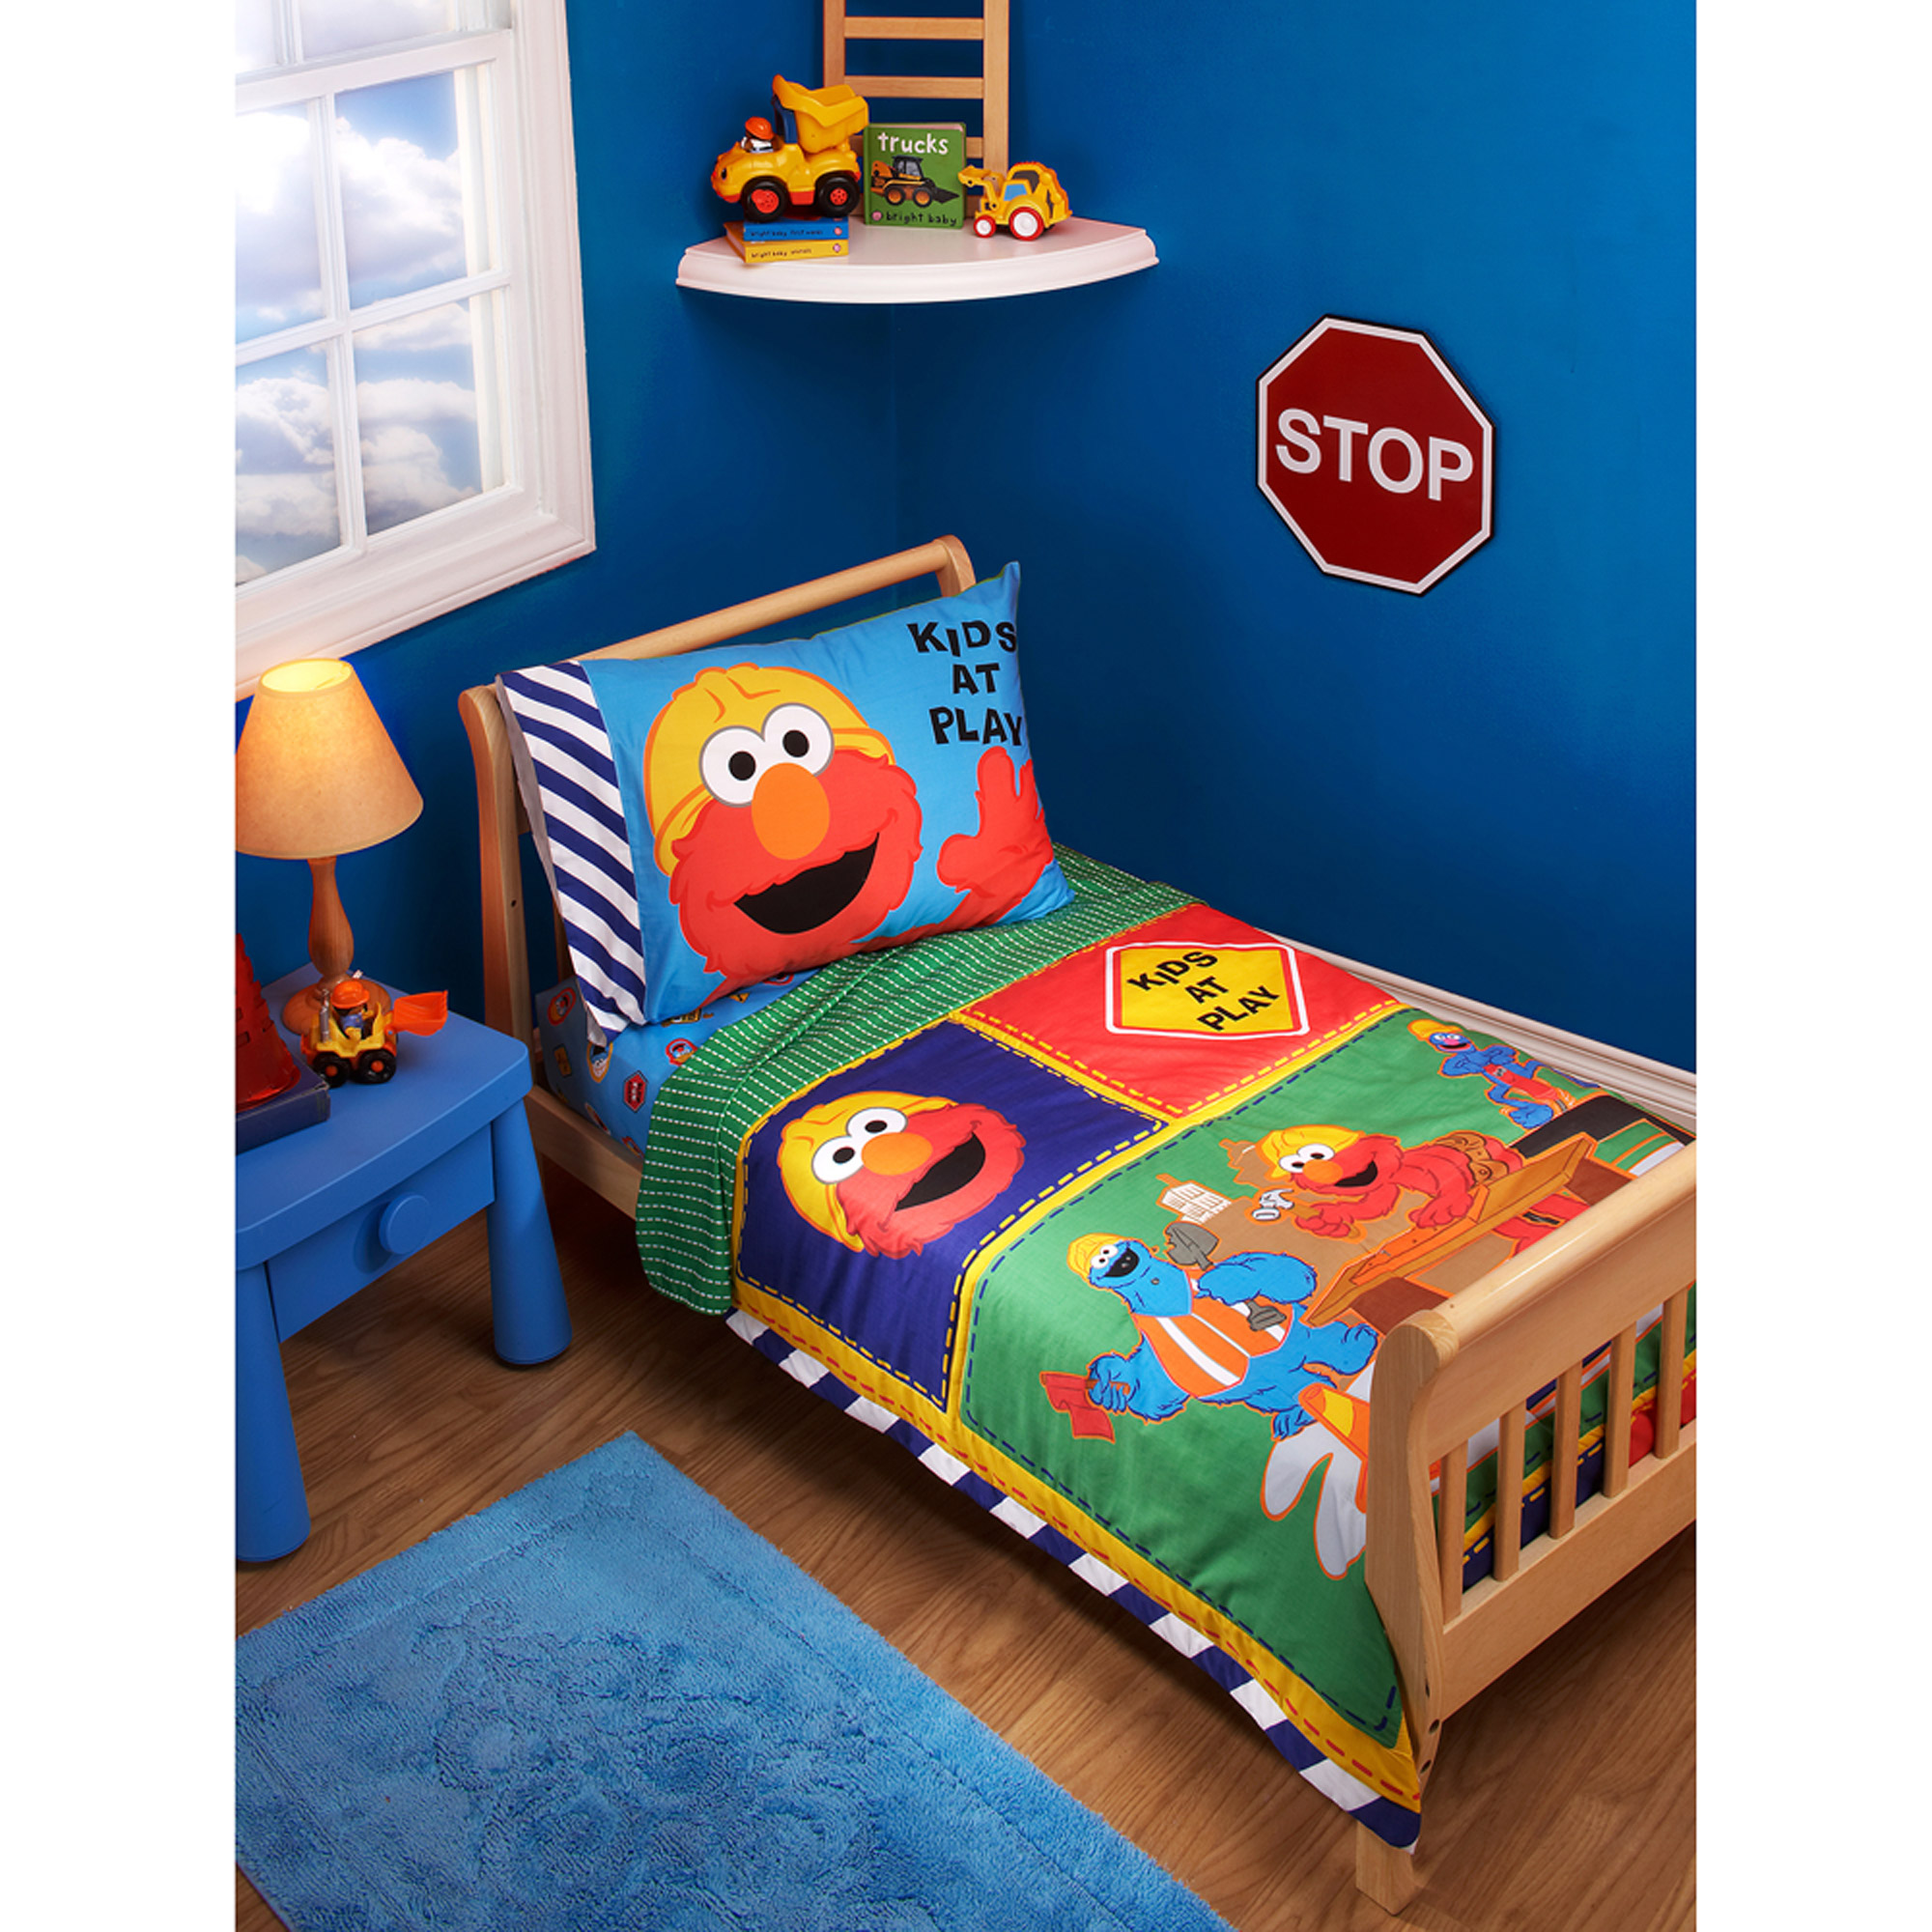 Sesame Street Construction Zone 3pc Toddler Bedding Set with BONUS Matching Pillow Case